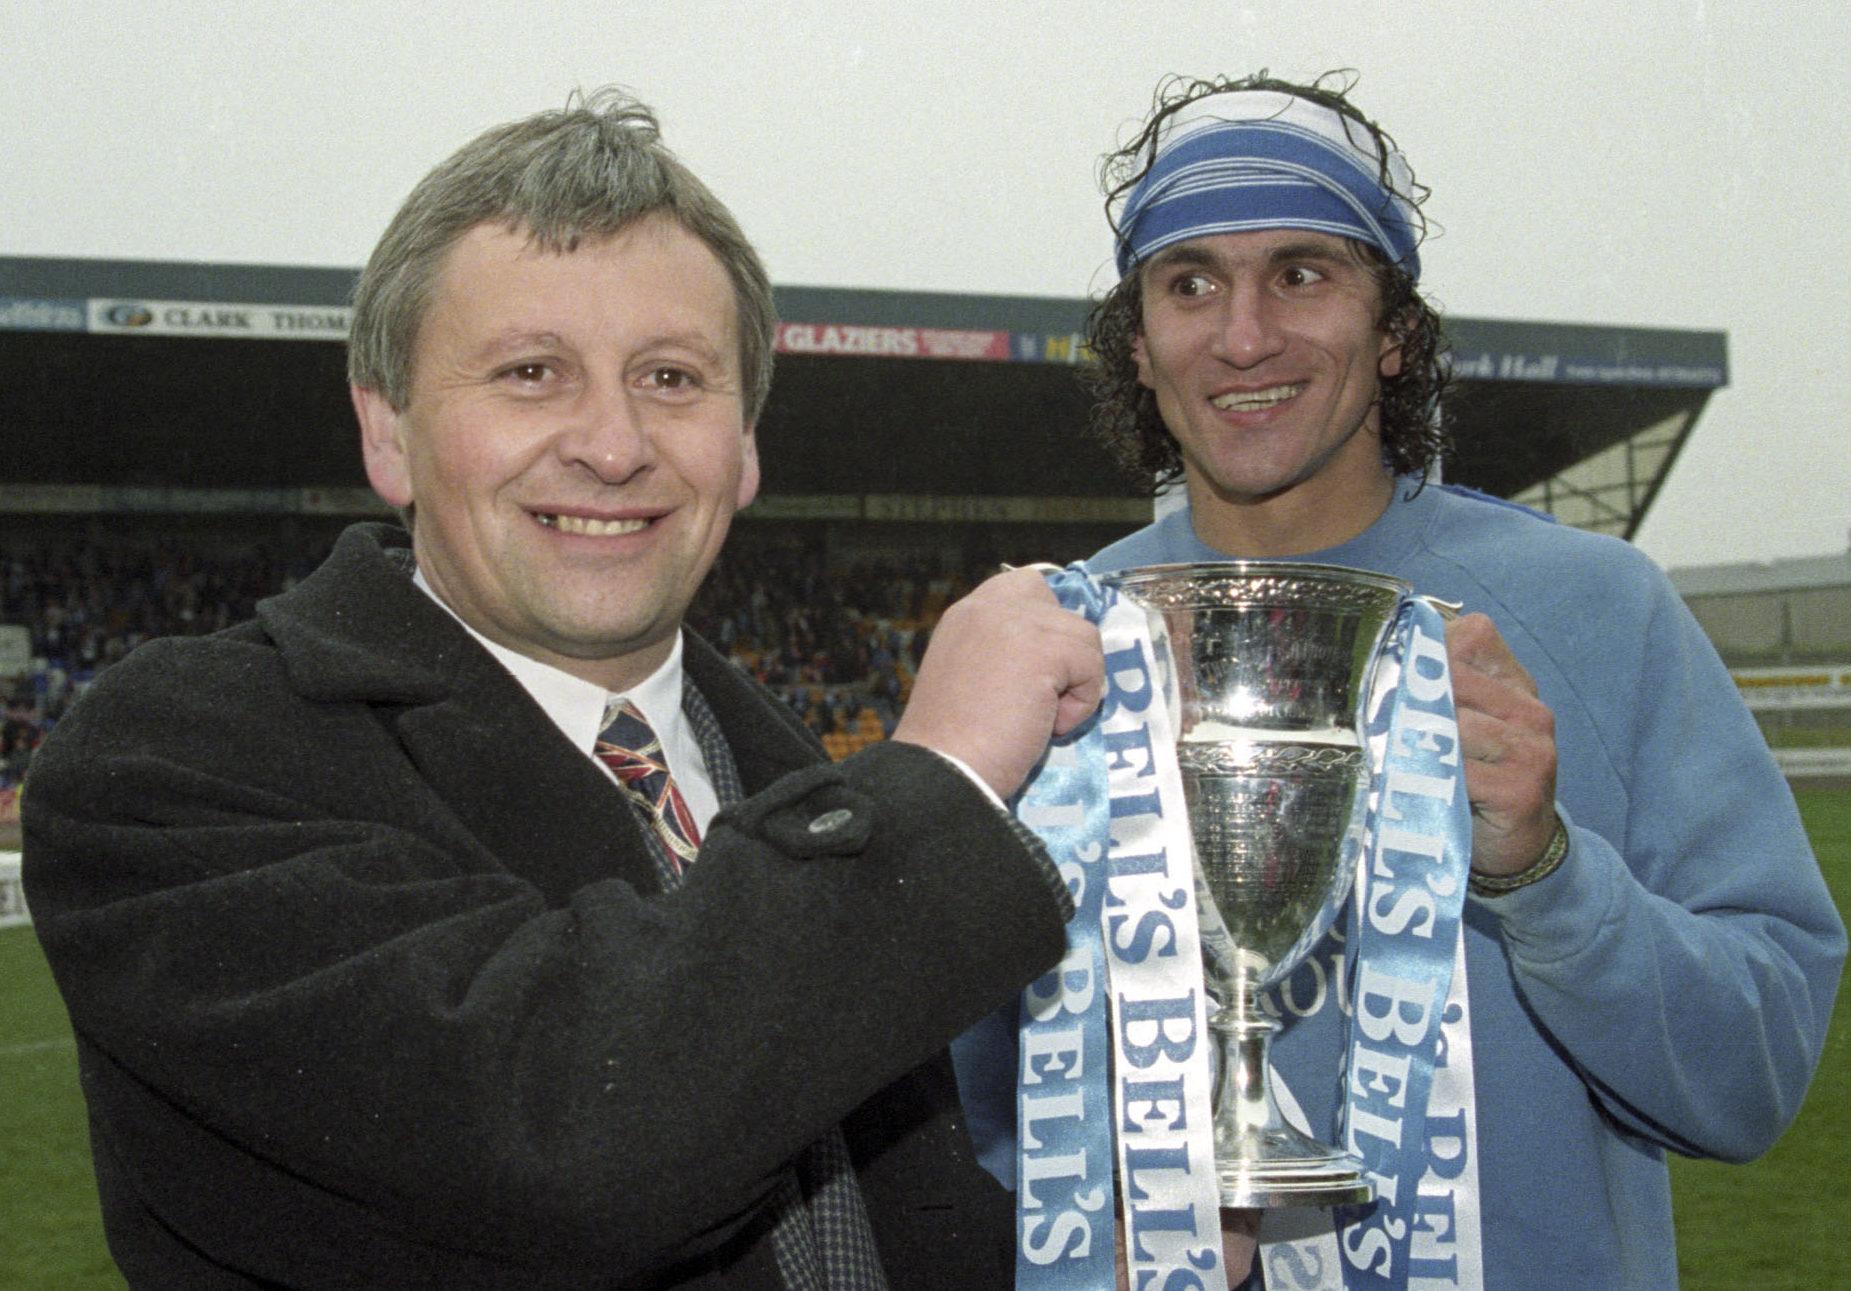 Attila Sekerlioglu was a First Division champion under Paul Sturrock.